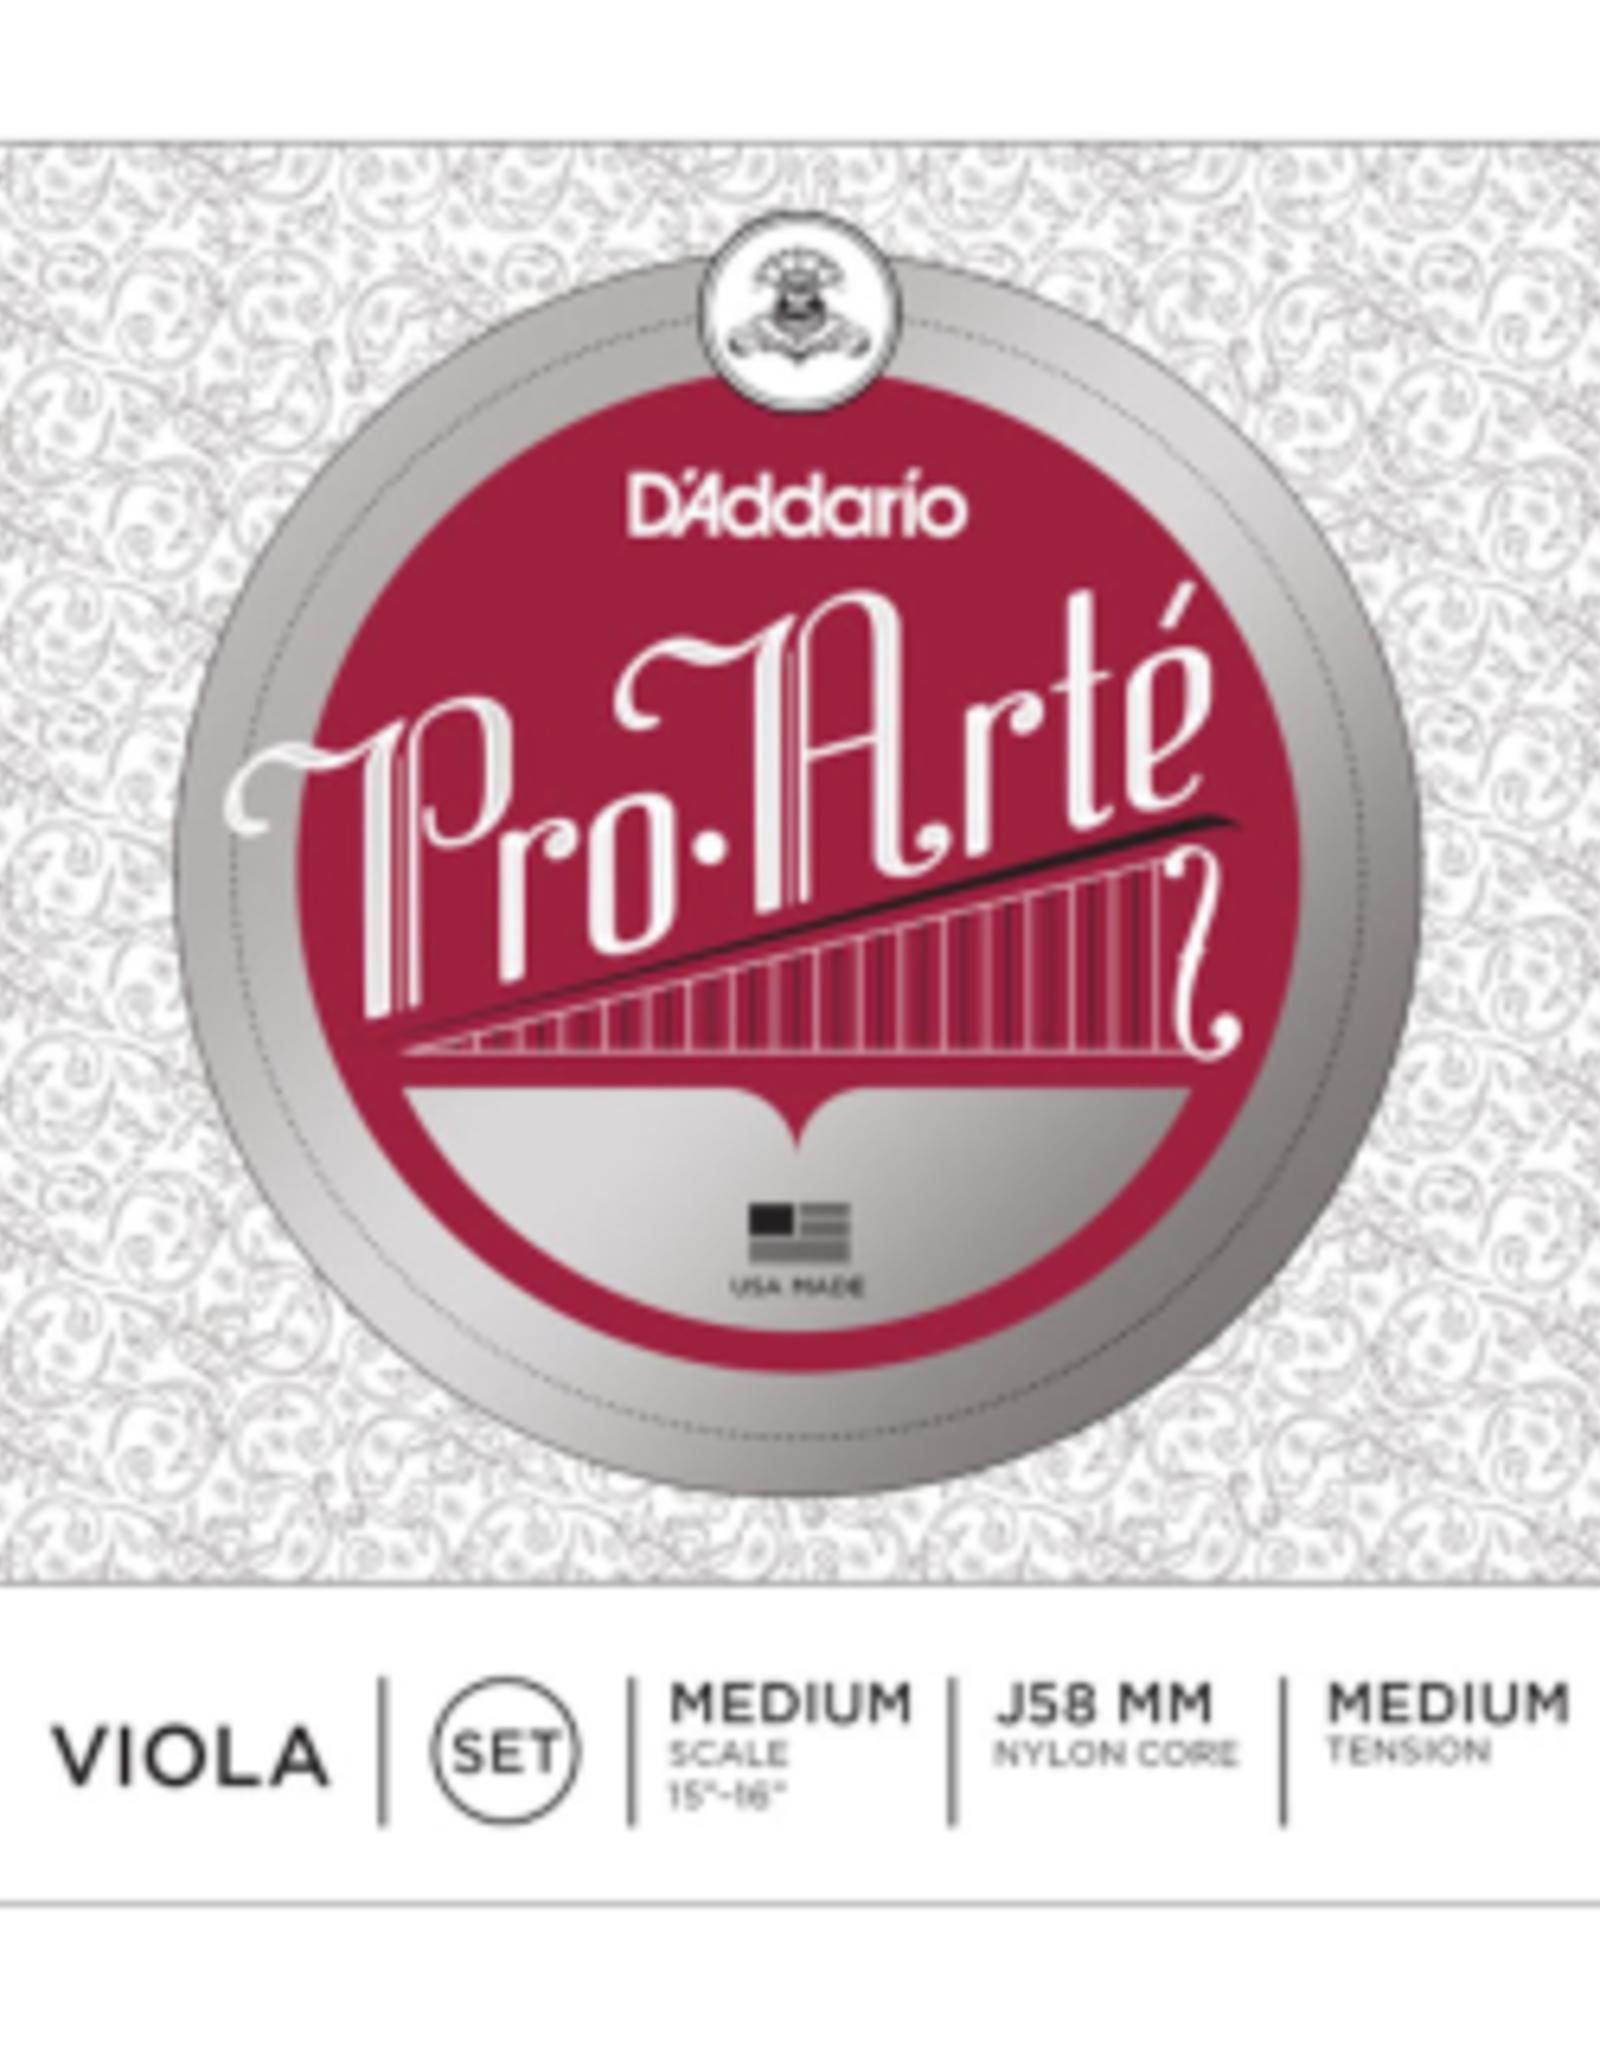 DADDARIO Pro Arte snaar voor altviool, do (C-4) 16+, medium, silver